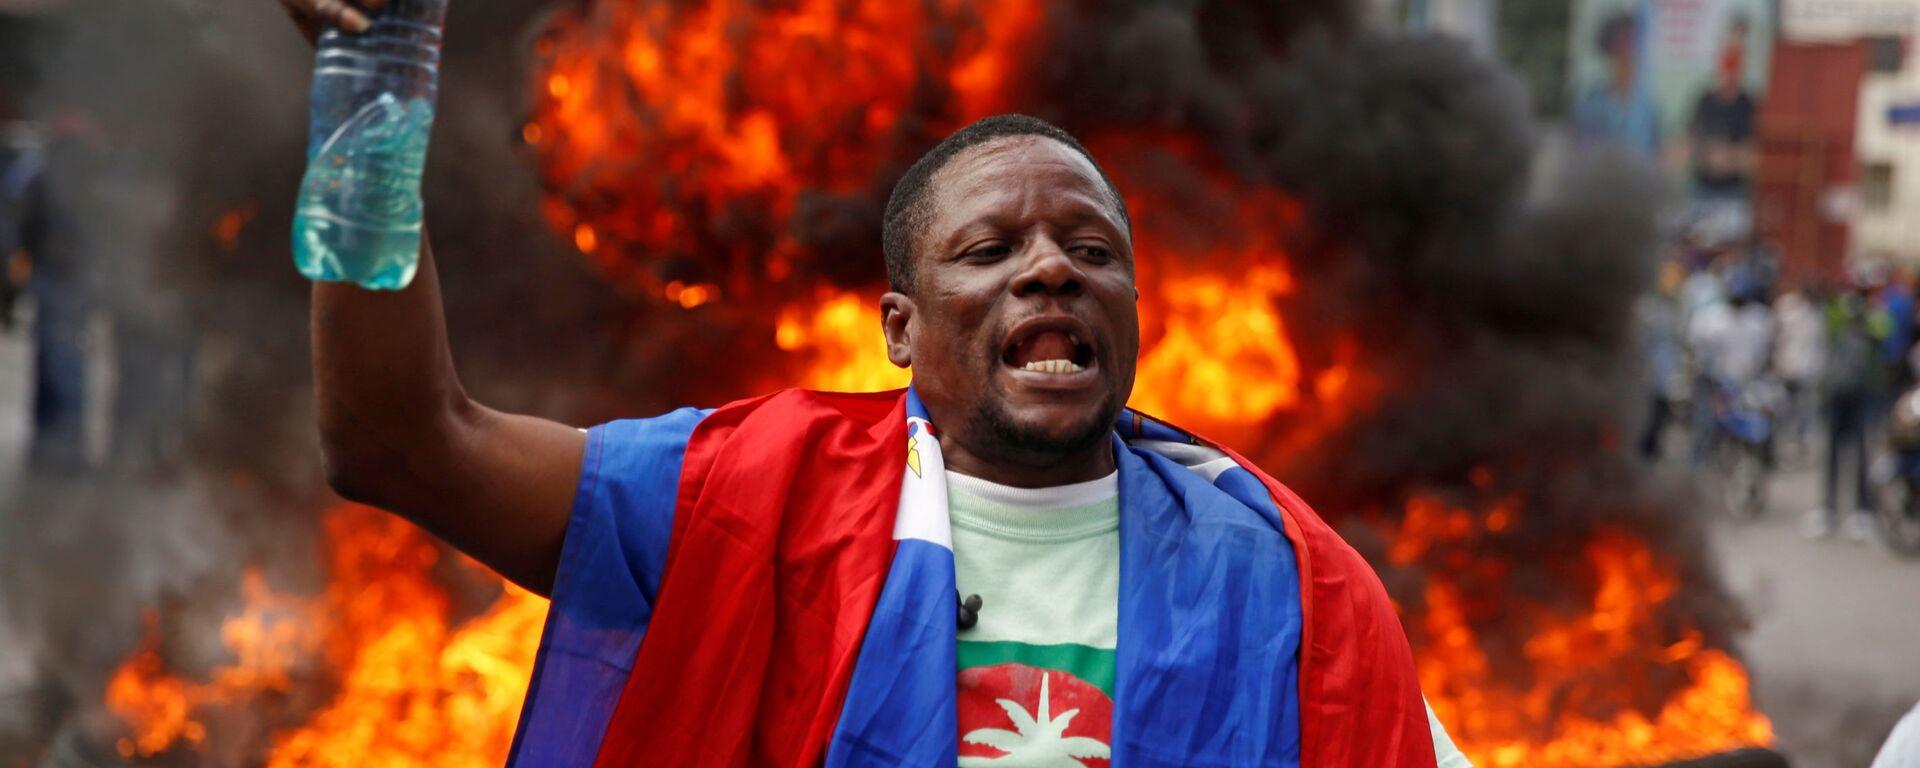 Un participante de protestas en Haití - Sputnik Mundo, 1920, 08.07.2021